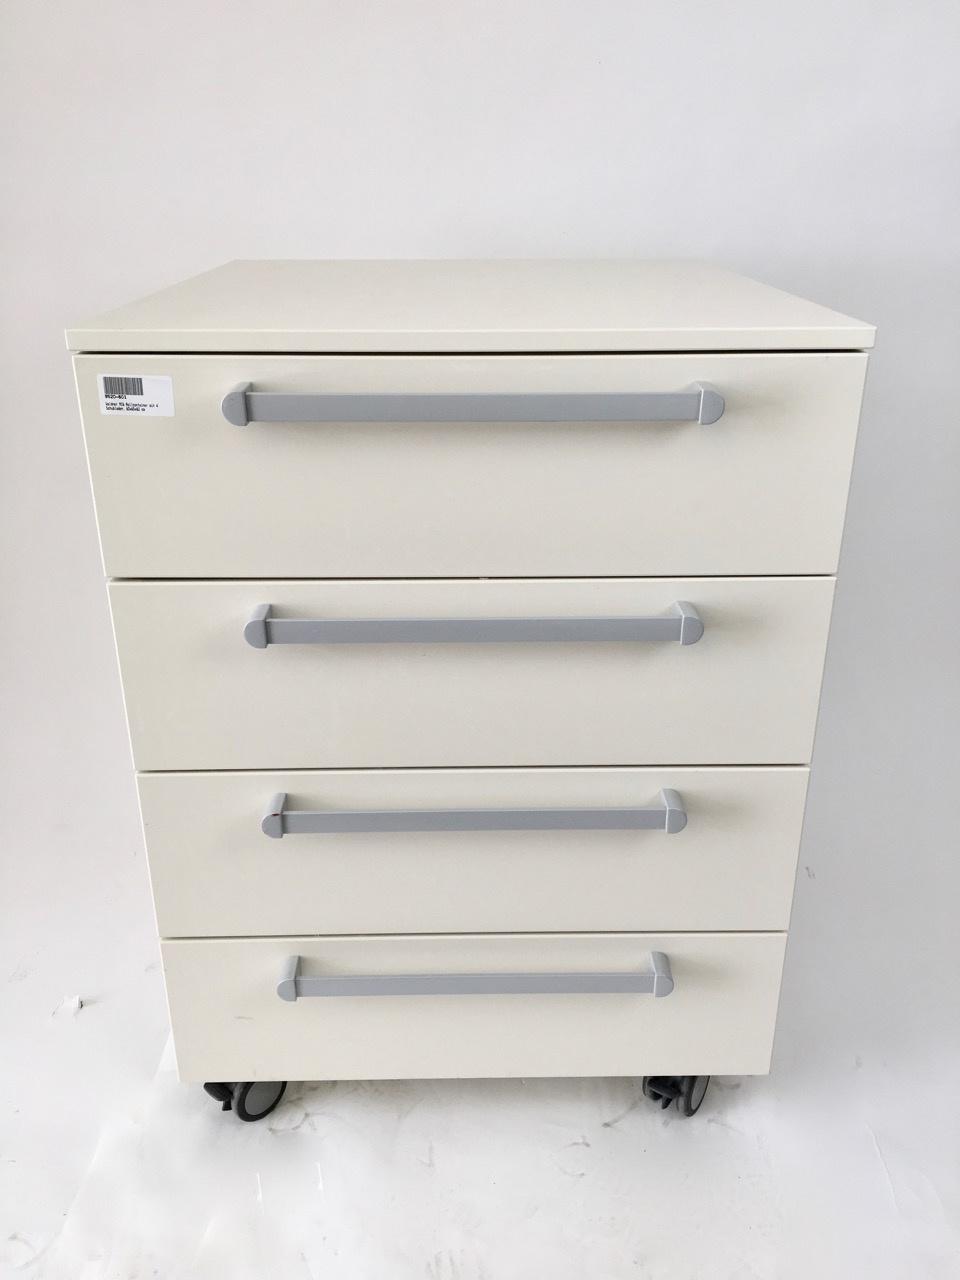 Waldner Waldner MC6 mobile cabinet, 4 drawers, 60 cm width, 82cm height